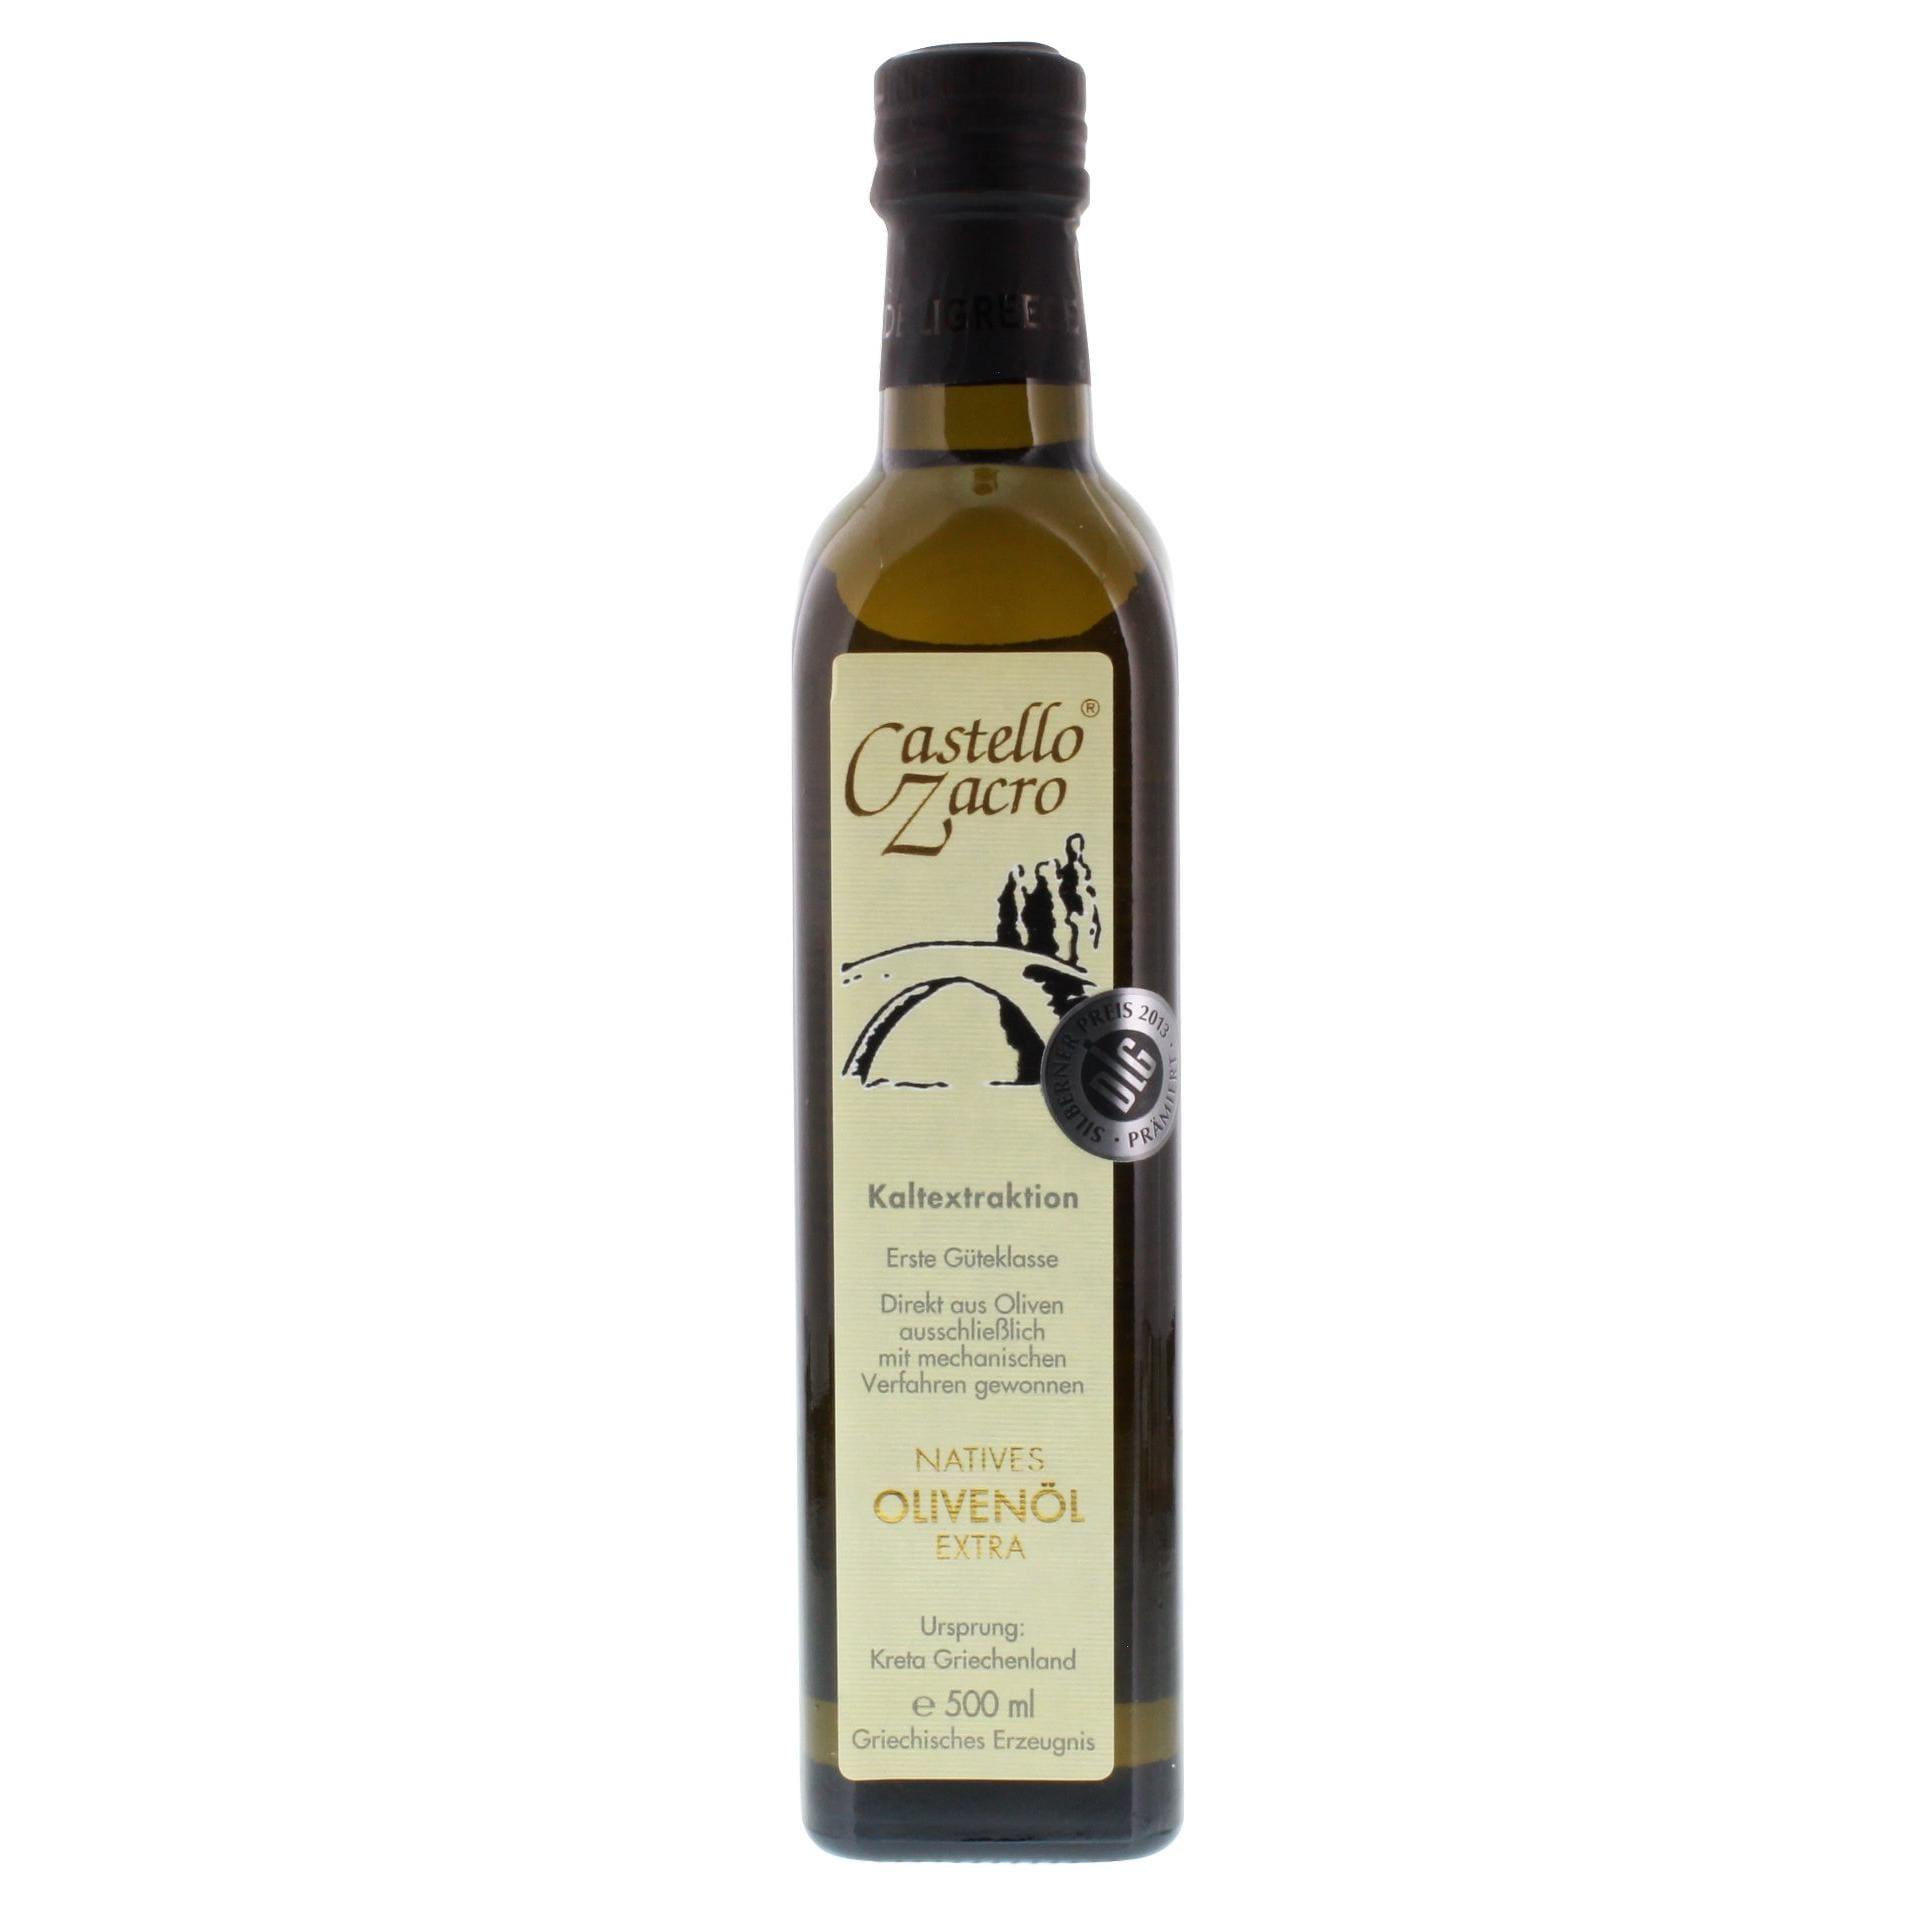 Castello Zacro - Natives Olivenöl Extra Kaltextraktion Erste Güteklasse - 500ml